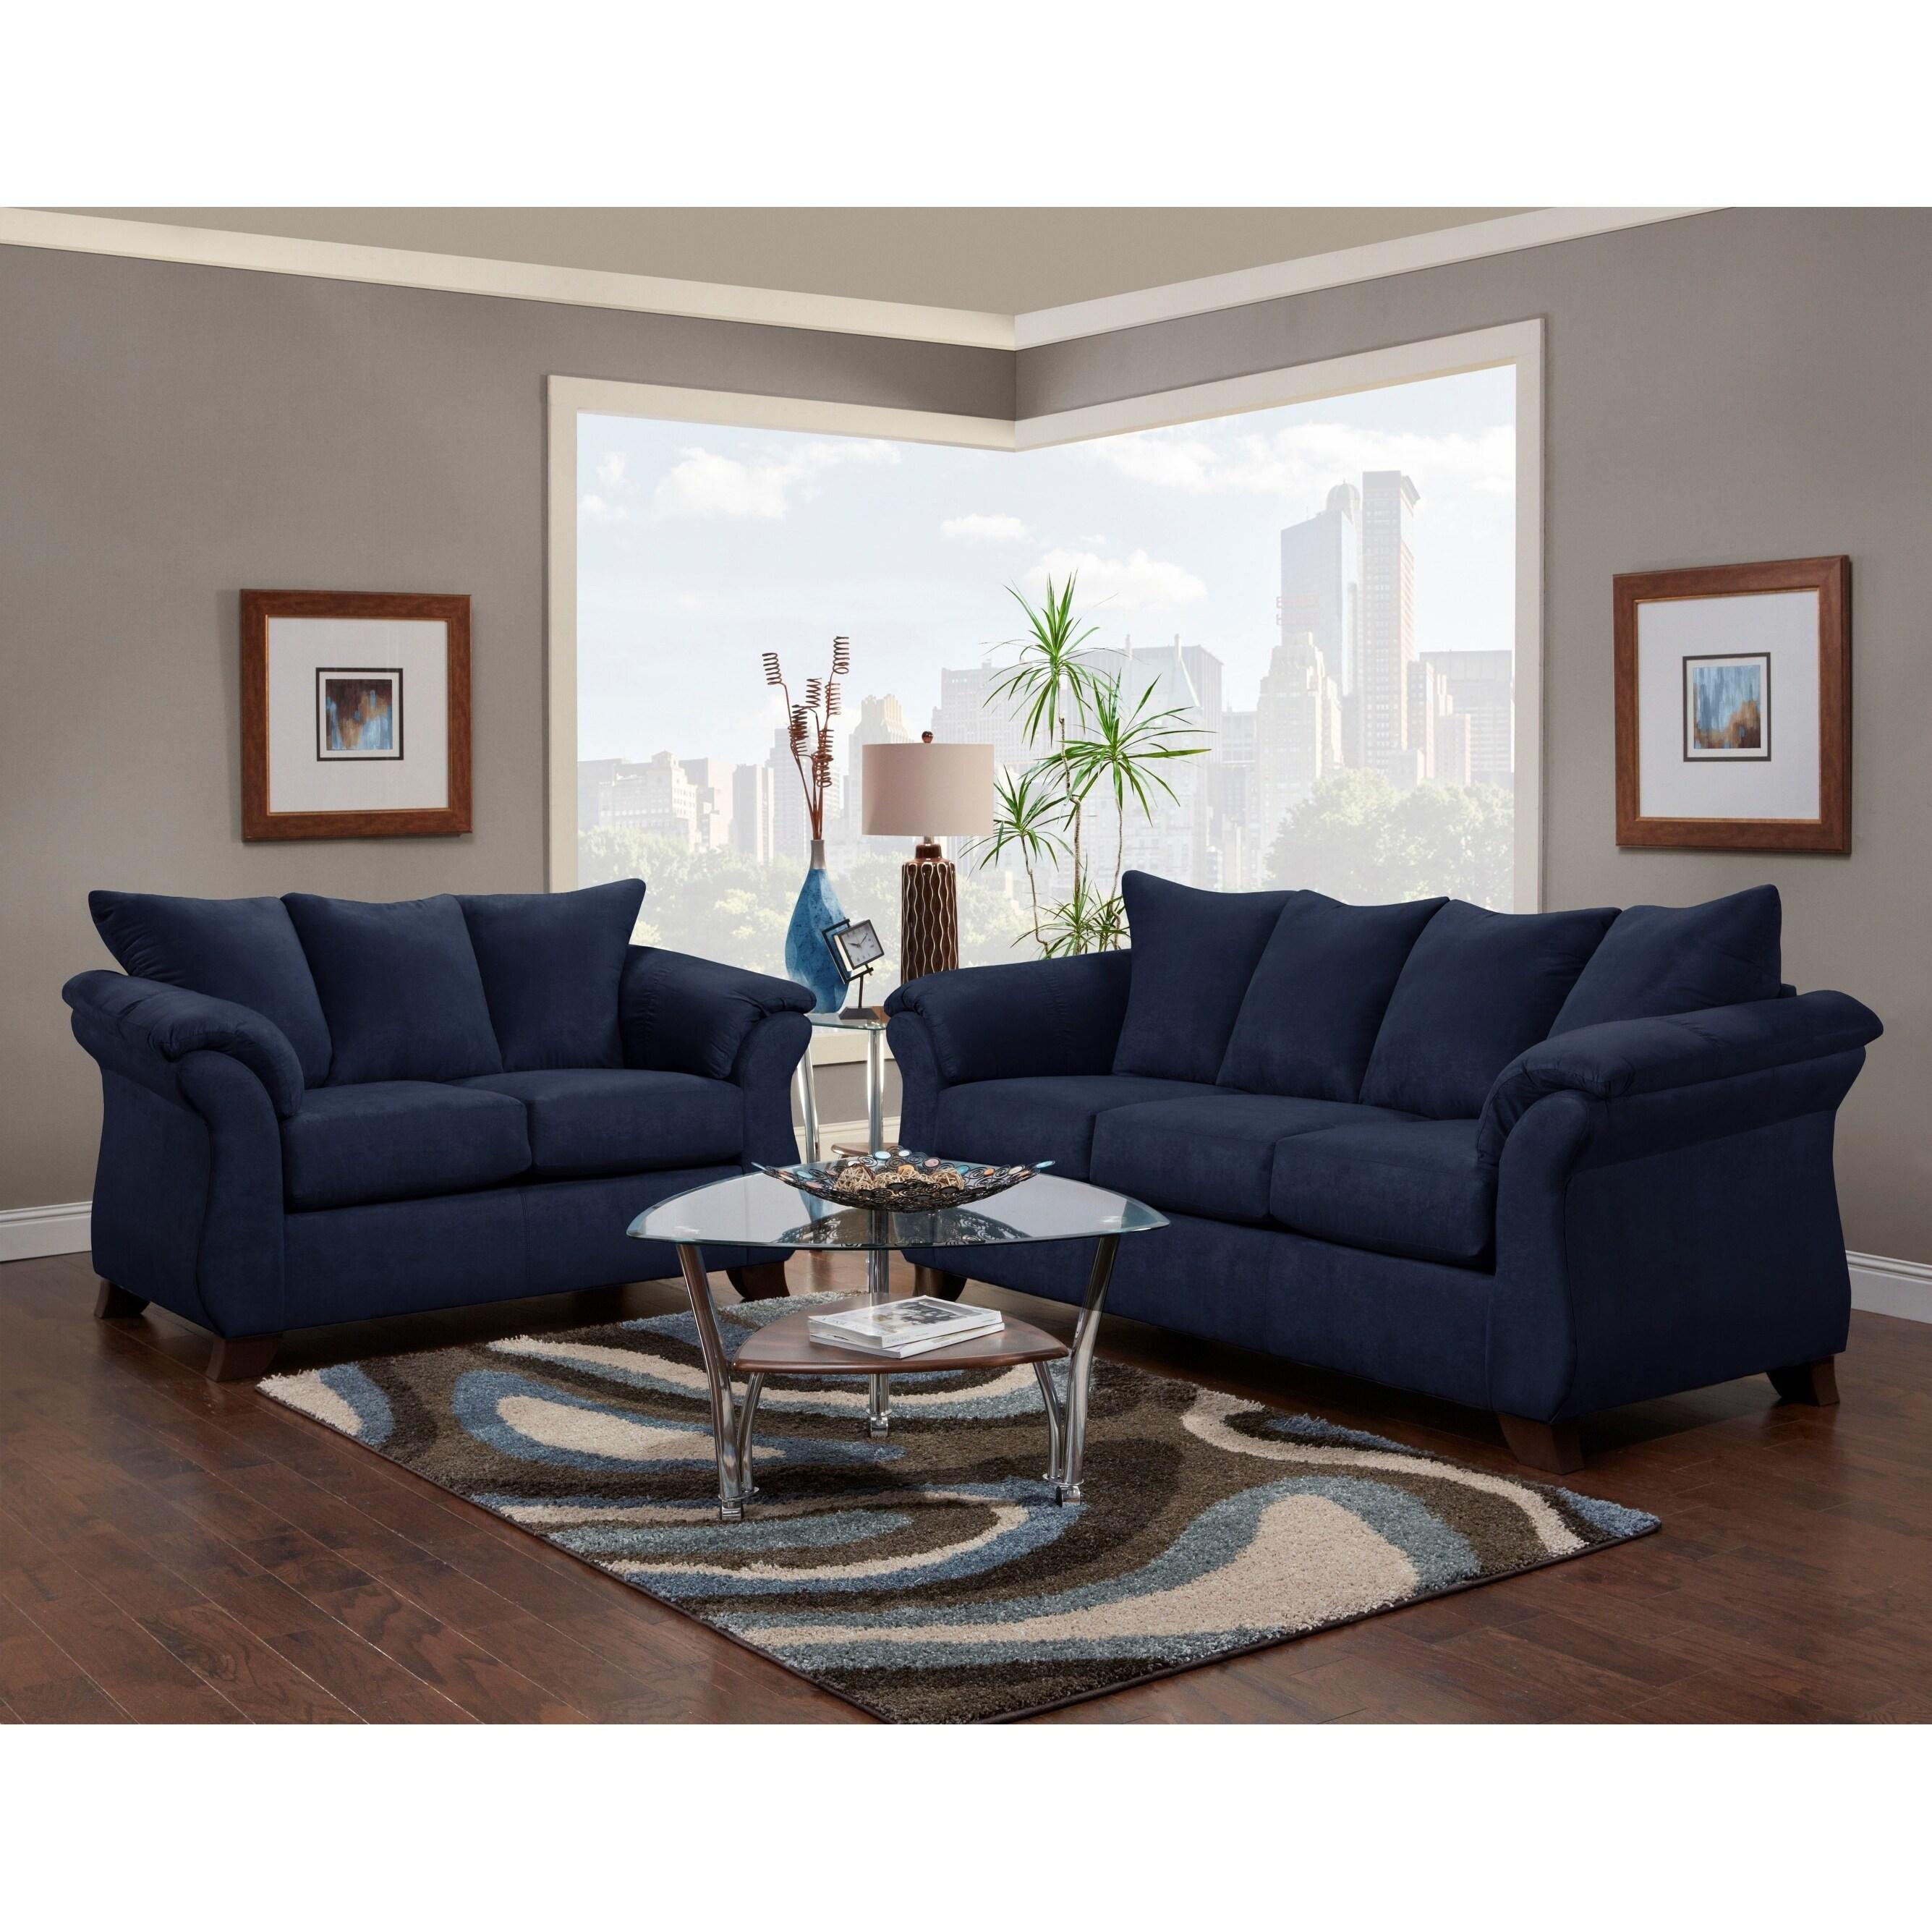 Aruca Navy Blue Microfiber Pillow-back Sofa - On Sale - Overstock - 25572334